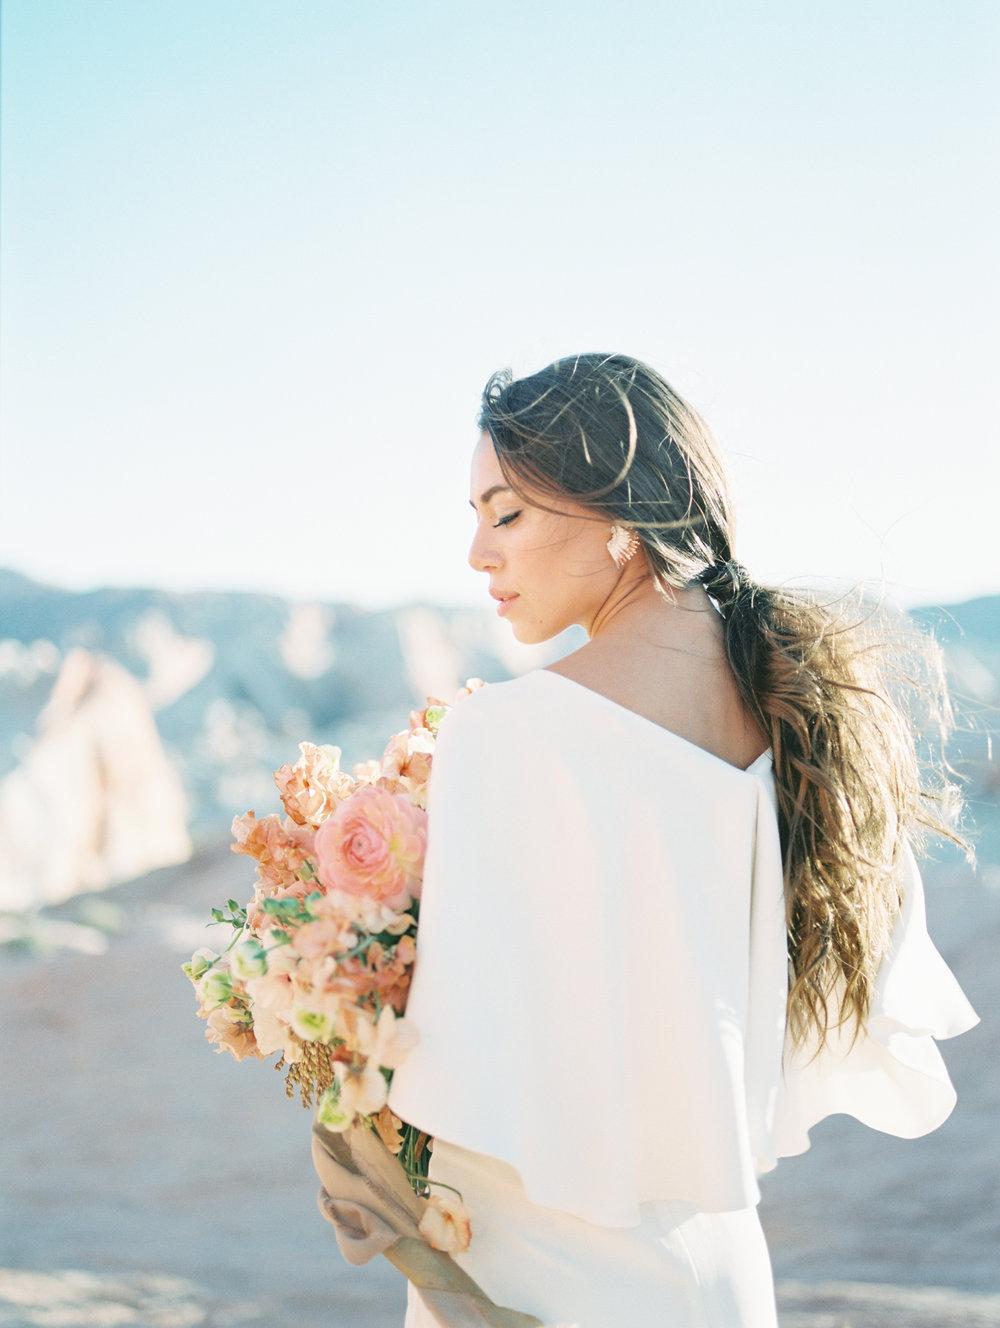 AKP_Desert_Wedding_Bridal_Shoot_Film_Fine_Art_Wedding_Photographer_Los_Angeles-4.jpg